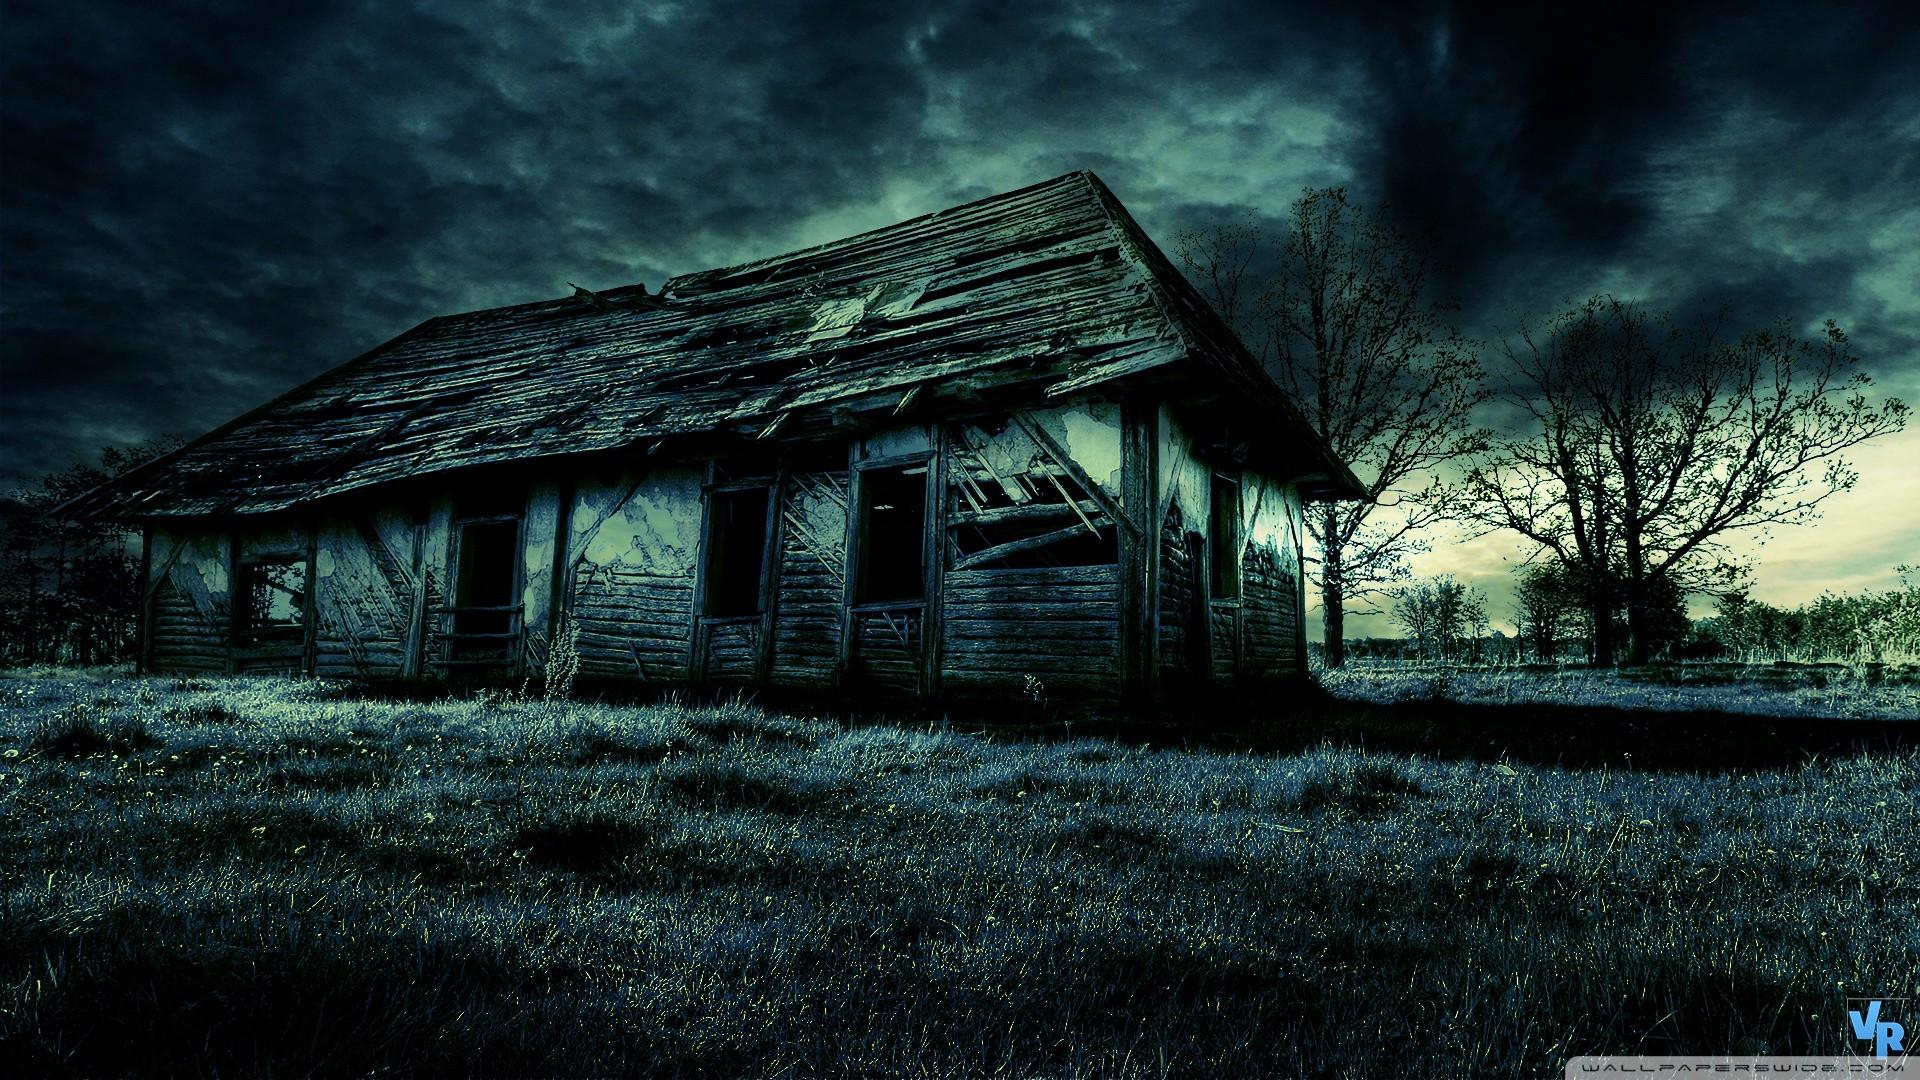 Dark wallpaper hd 75 pictures - Fantasy wallpaper 720p ...